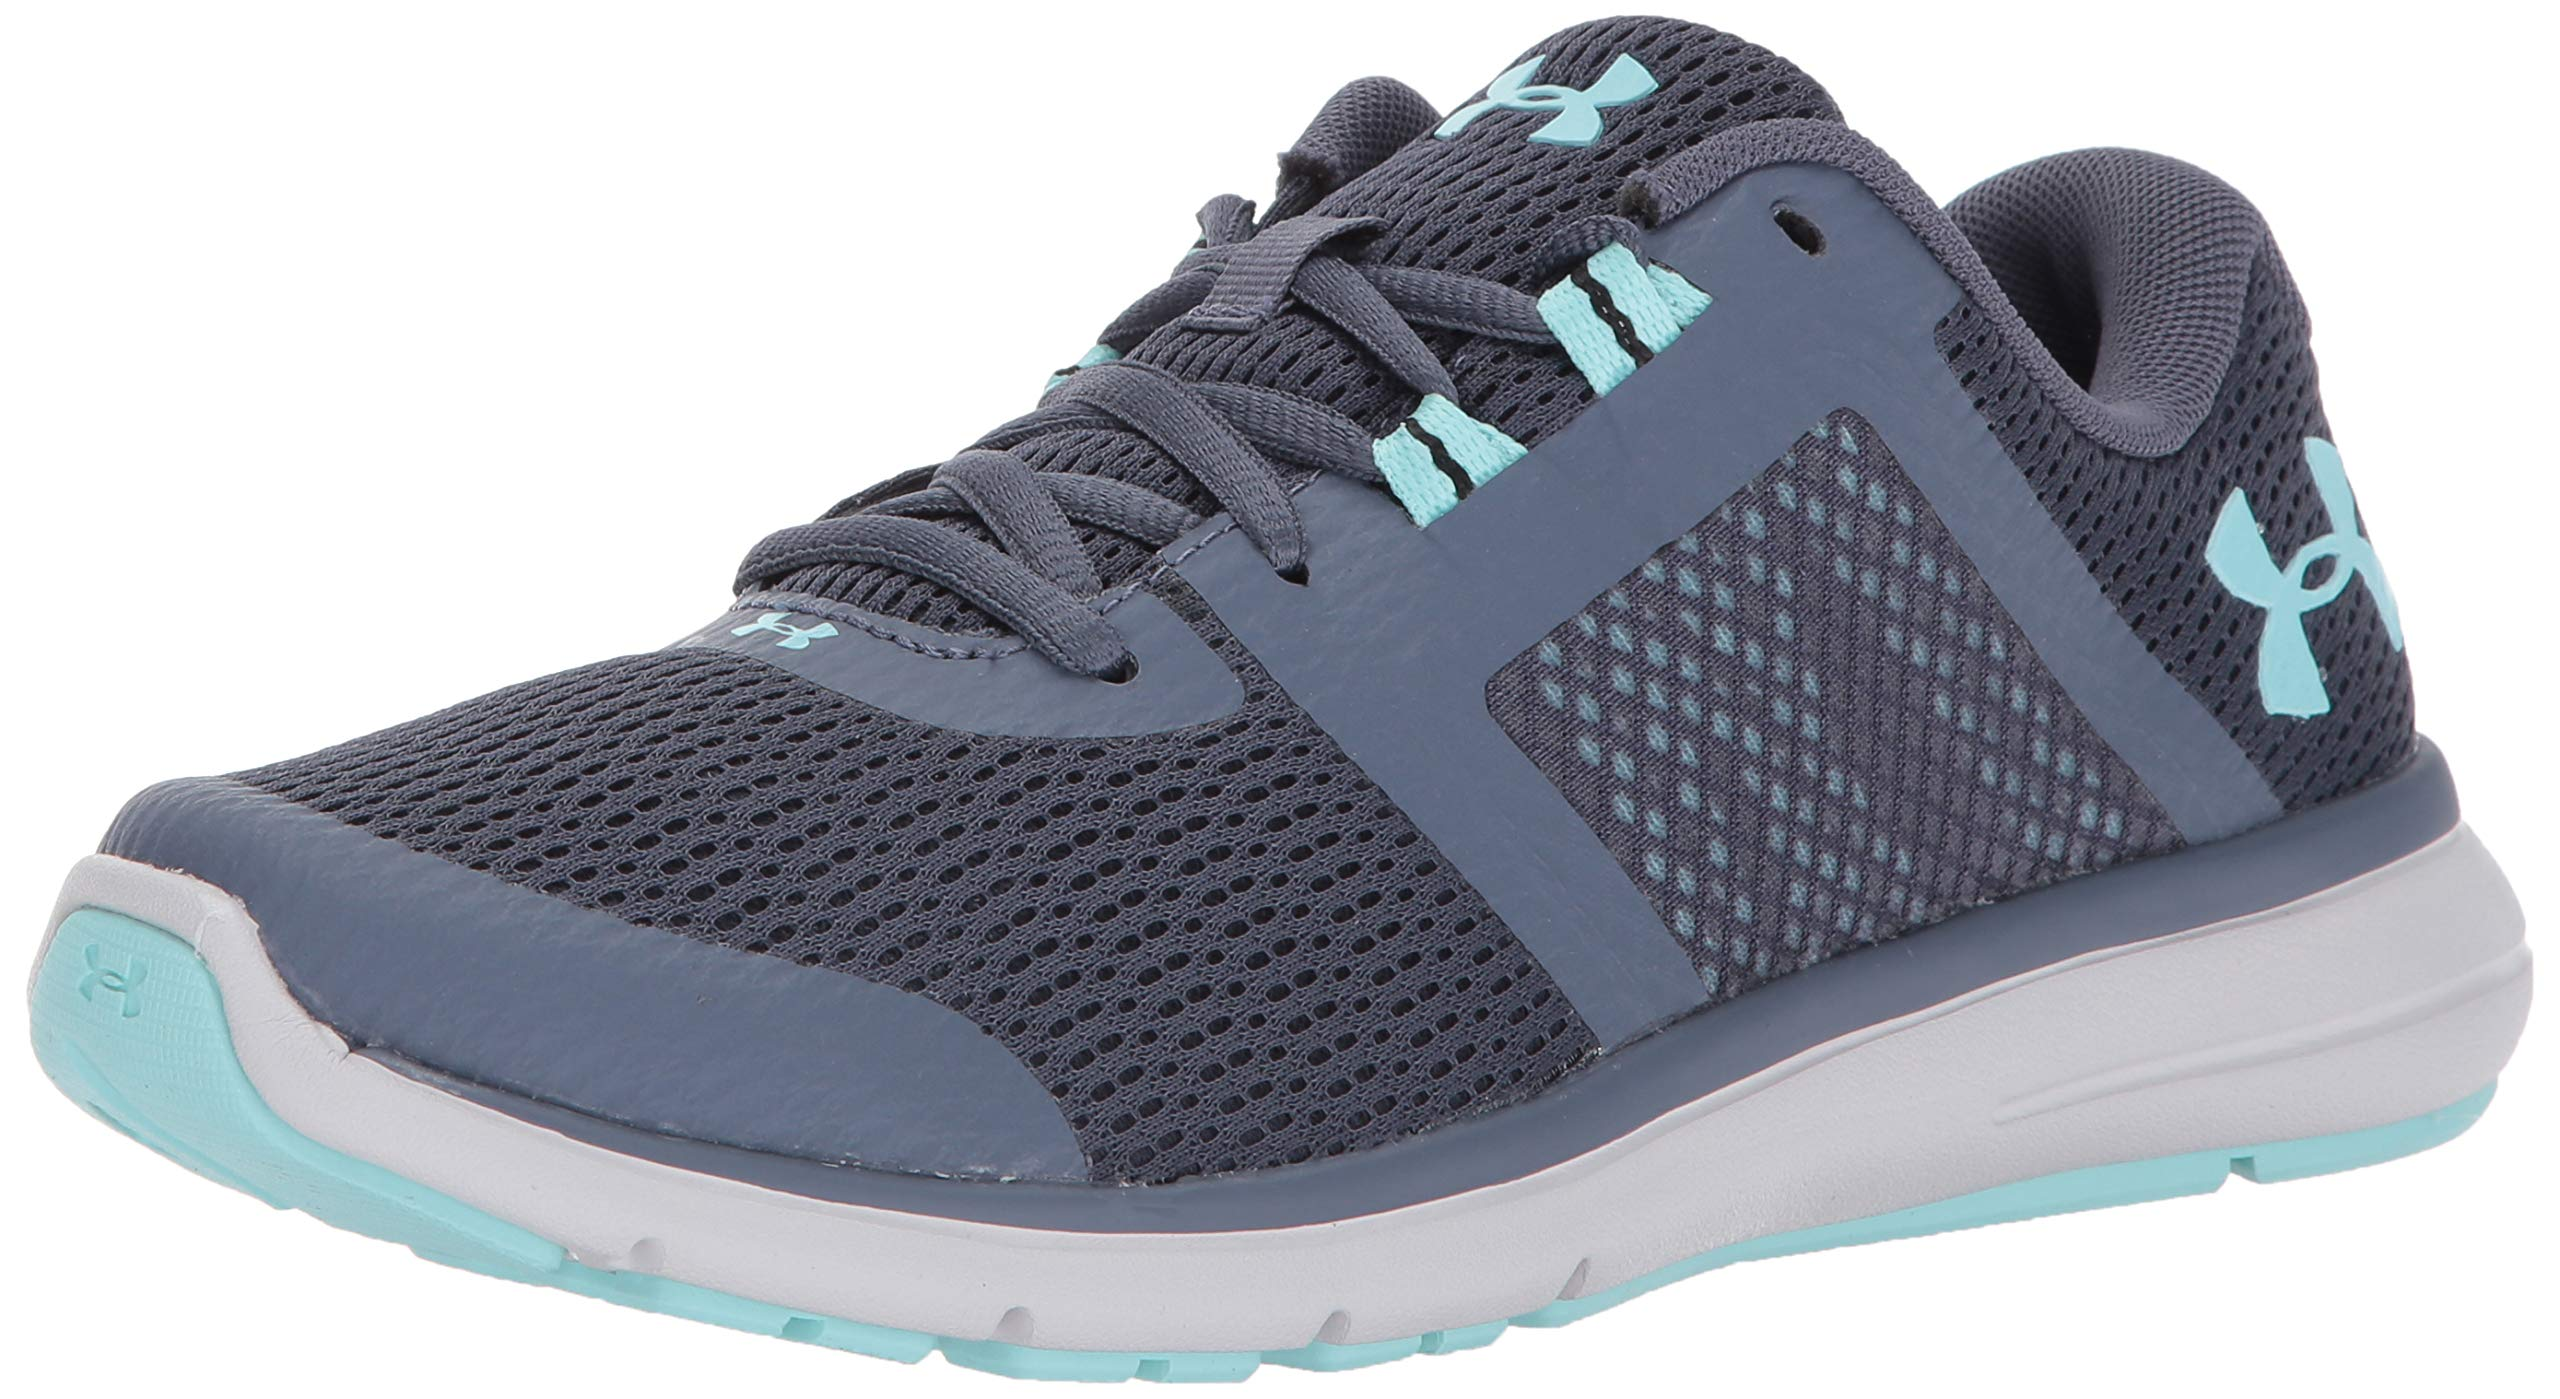 Under Armour Women's Fuse FST Running Shoe, Apollo